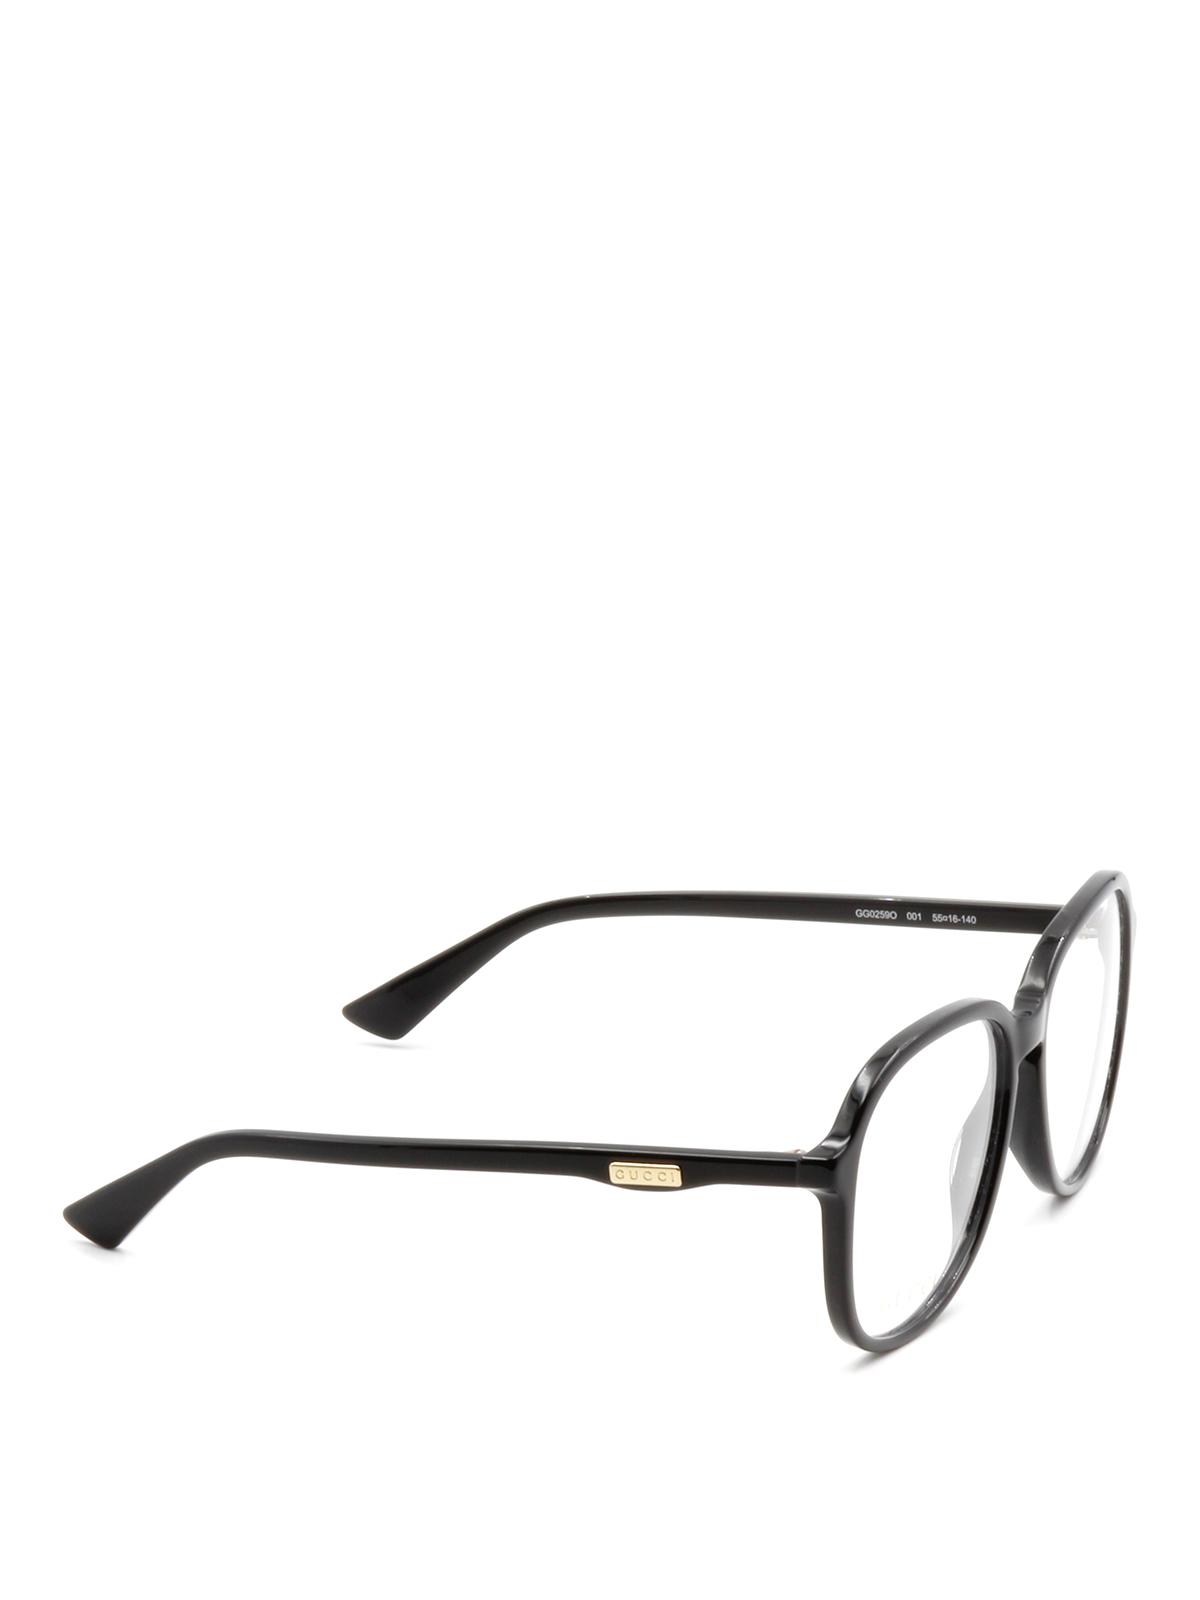 1ffcd8428702a Gucci - Black acetate frame eyeglasses - glasses - GG0259O1